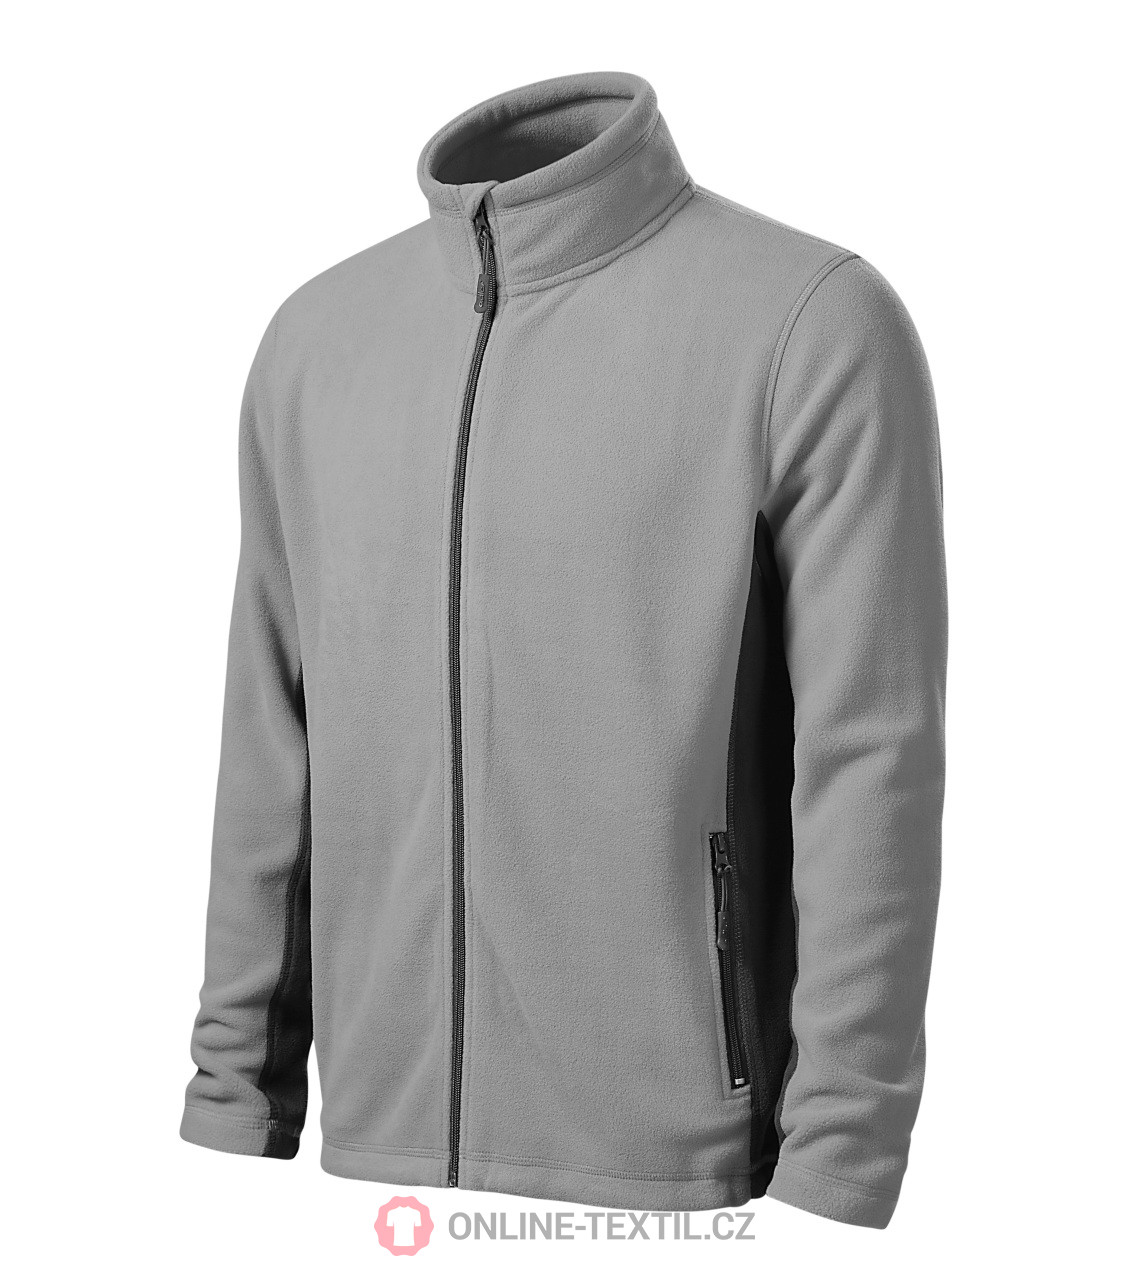 ADLER CZECH Pánská fleece bunda mikina Frosty 527 - světle šedá z ... 205765b23eb